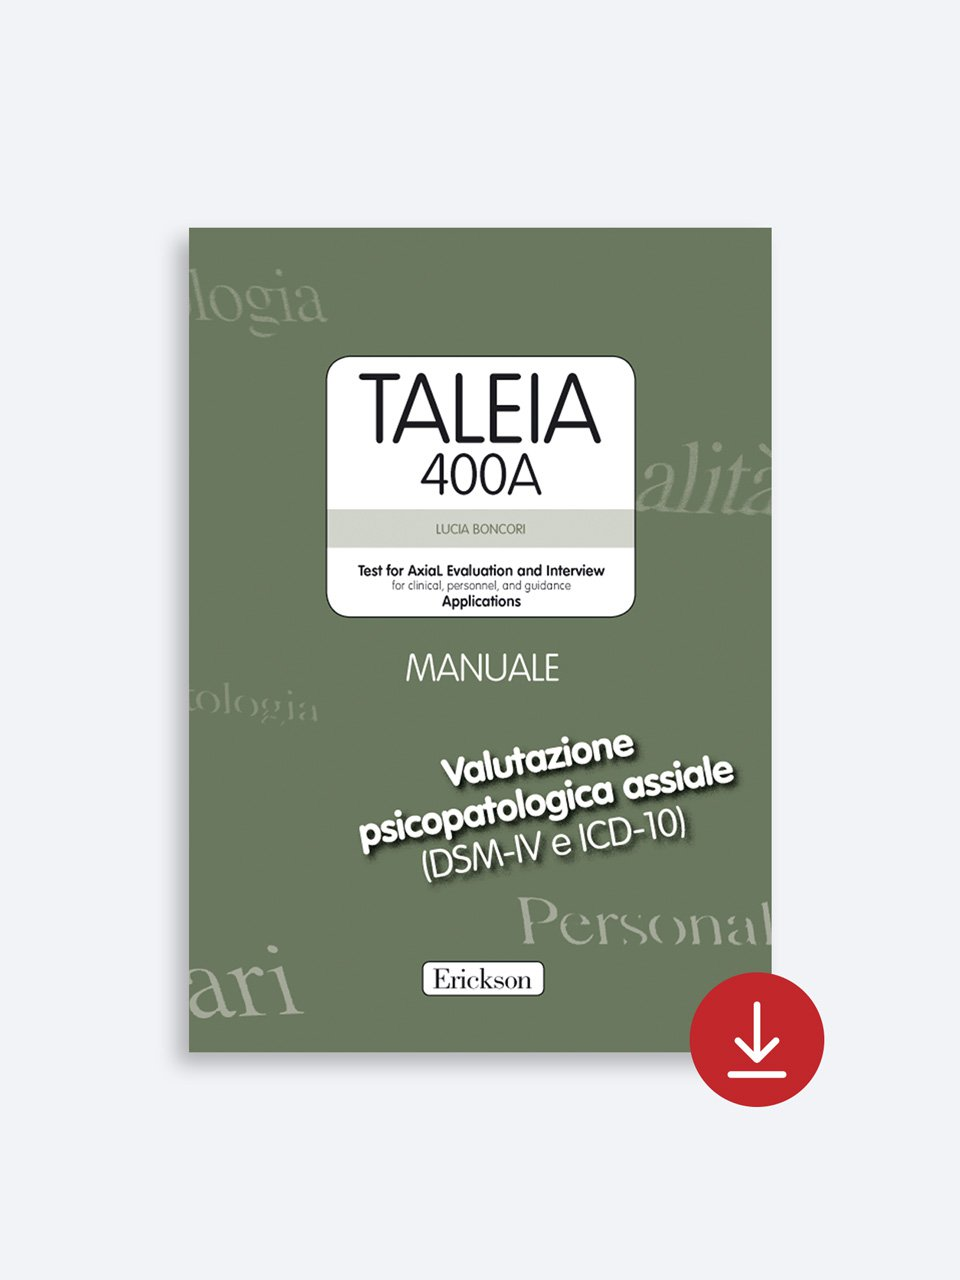 TALEIA-400A - Test for Axial Evaluation and Interview Applications - App e software per Scuola, Autismo, Dislessia e DSA - Erickson 2